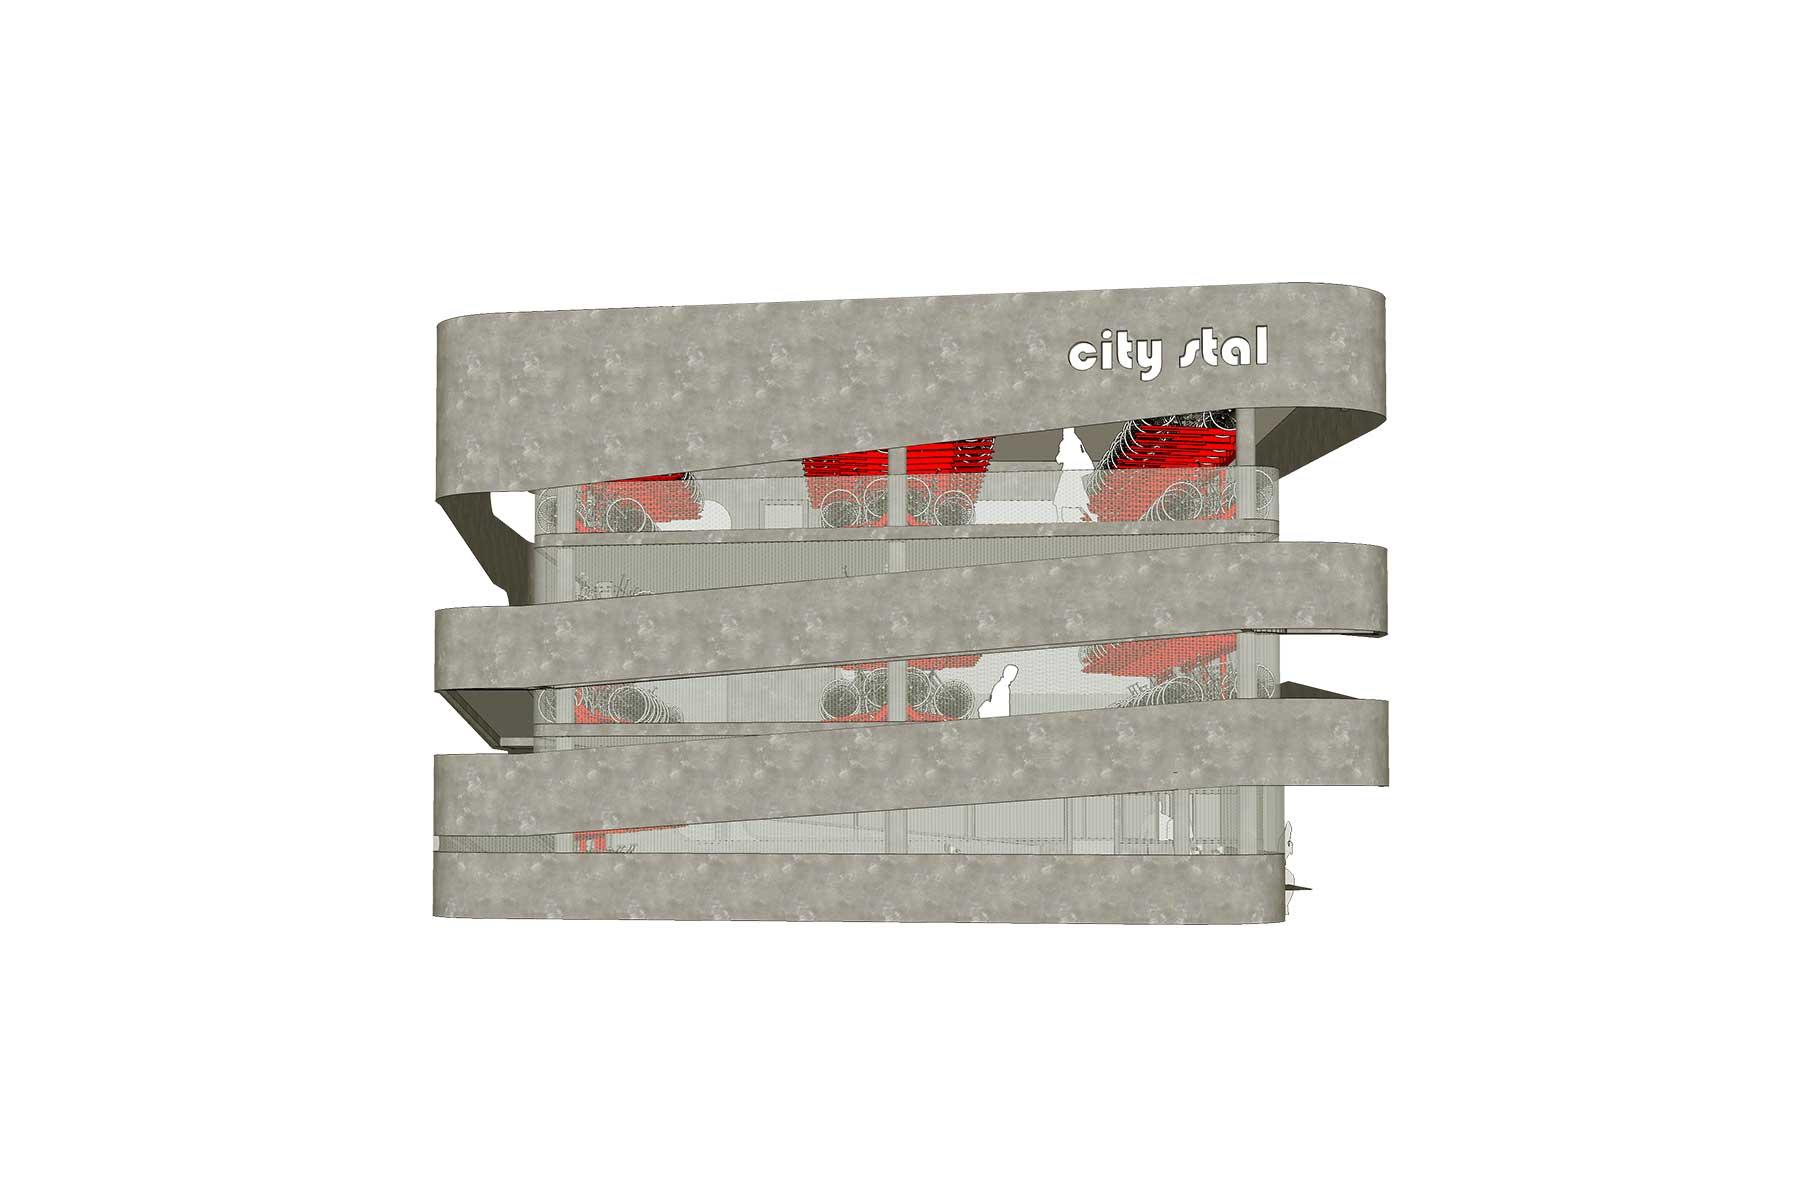 8A-Architecten-city-stal-nieuwegein-12